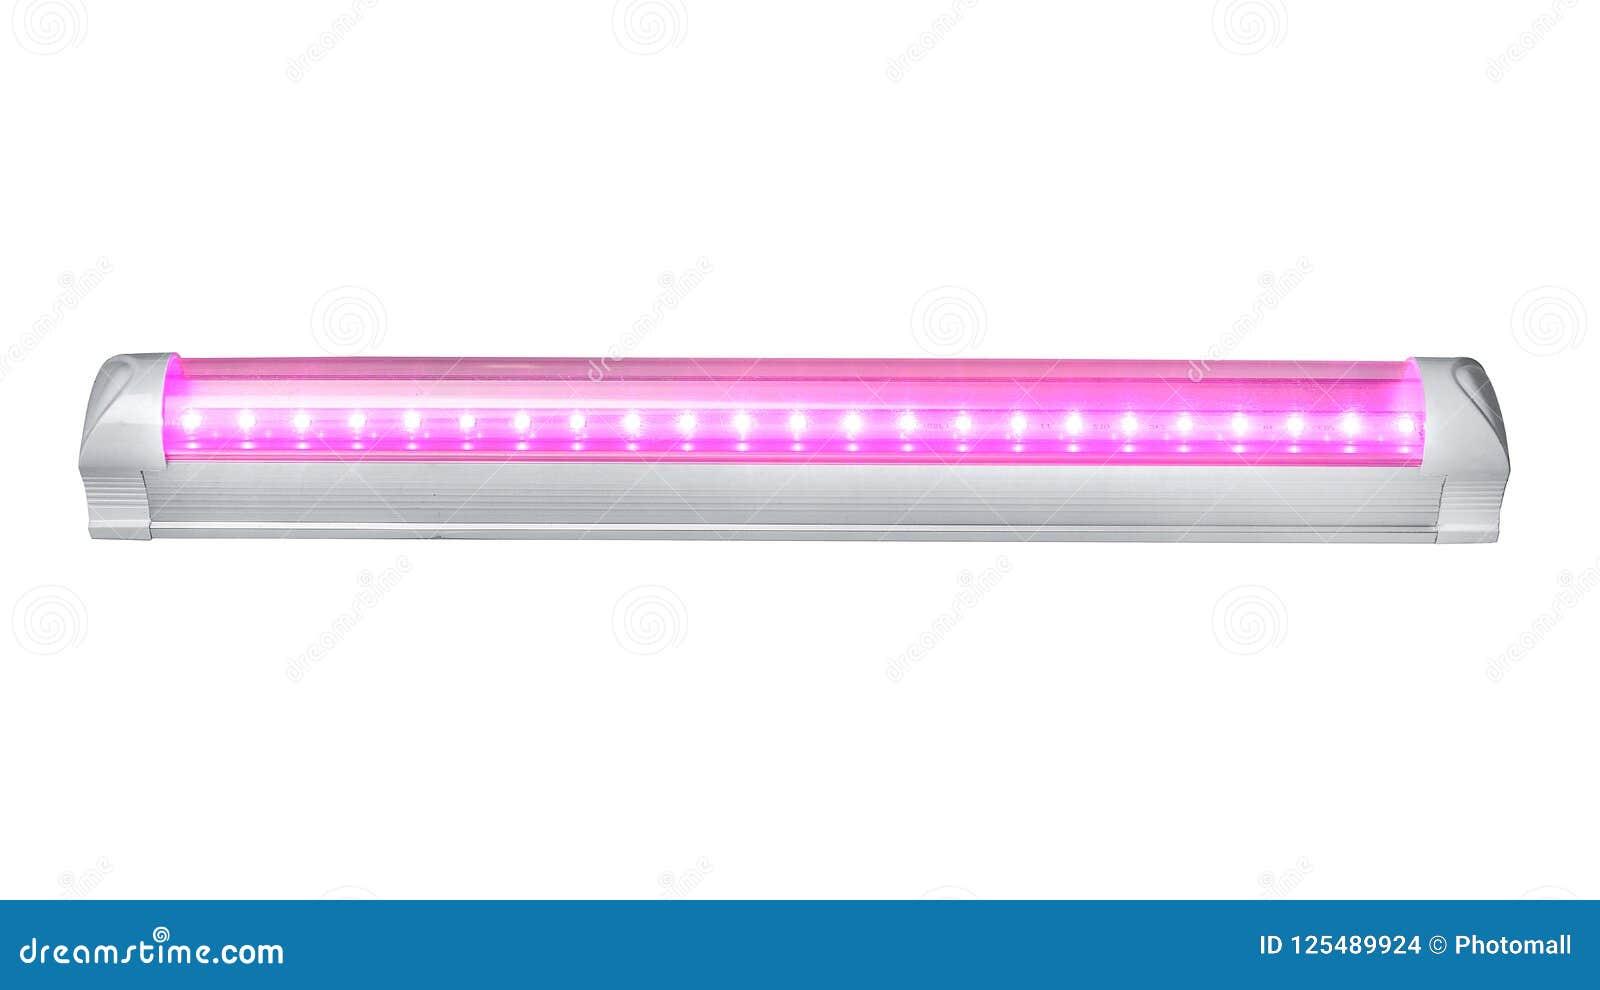 Led plant growth Light tube